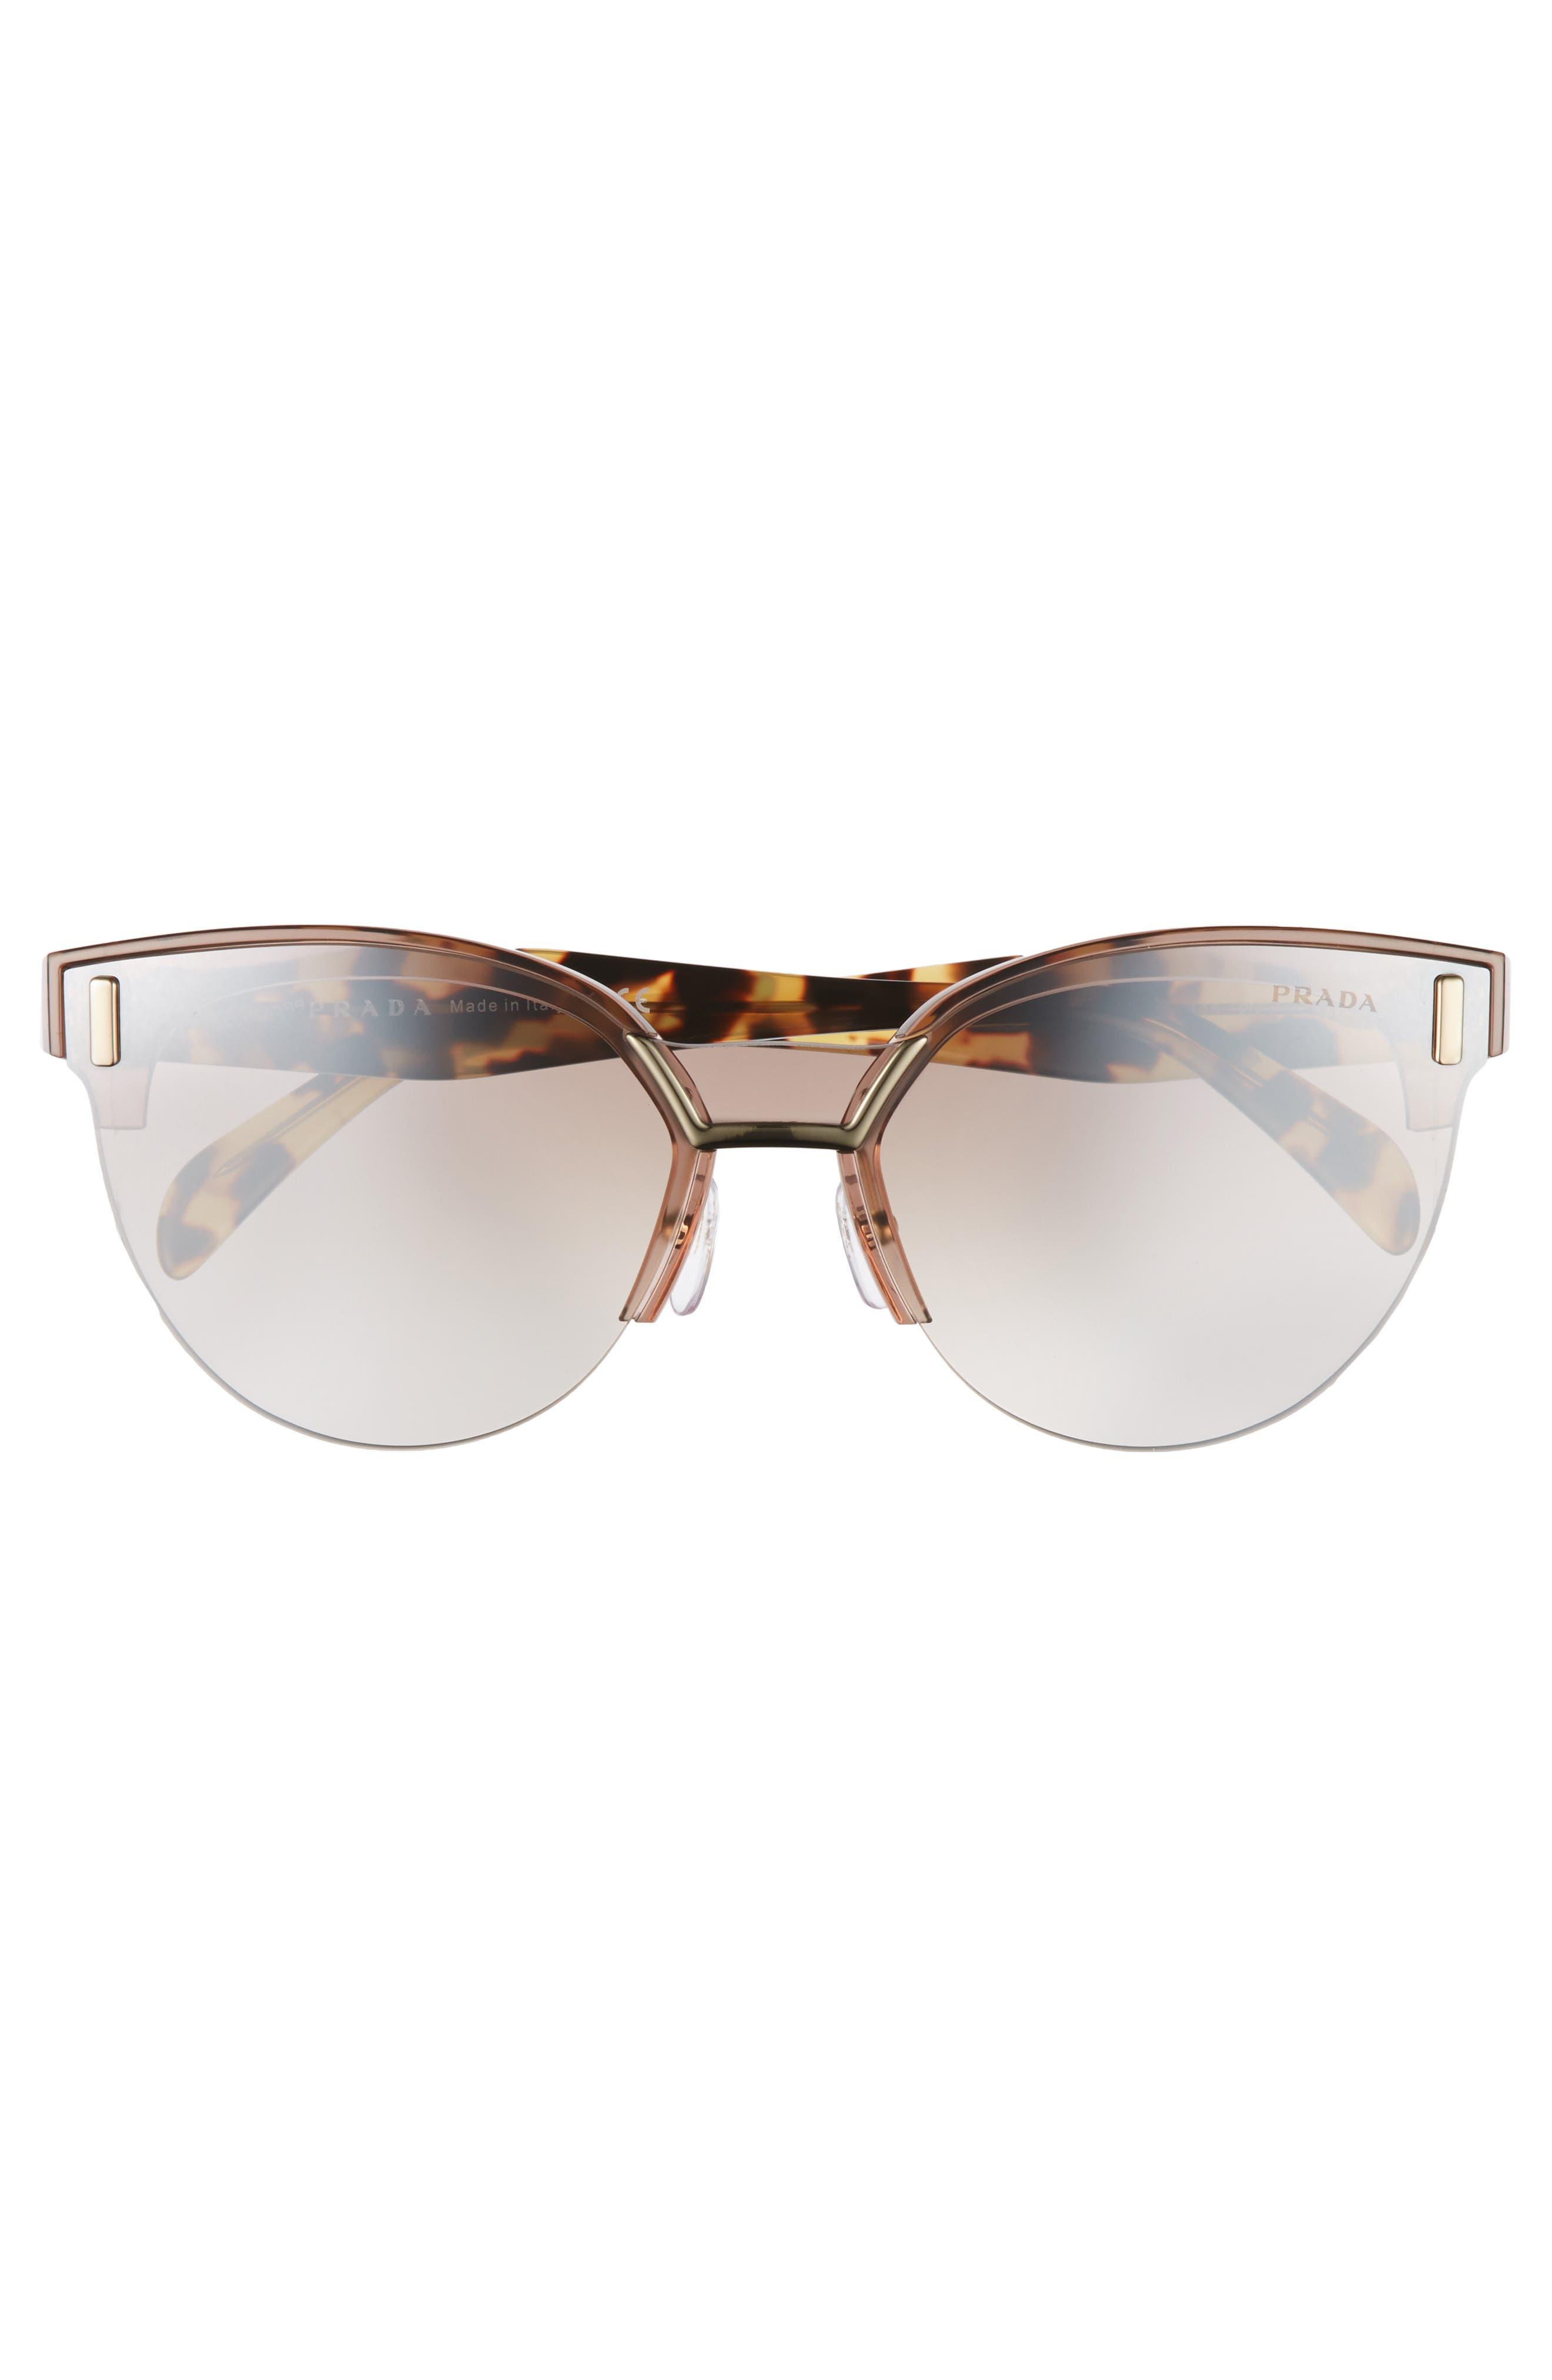 43mm Semi Rimless Sunglasses,                             Alternate thumbnail 4, color,                             TRANSPARENT BROWN